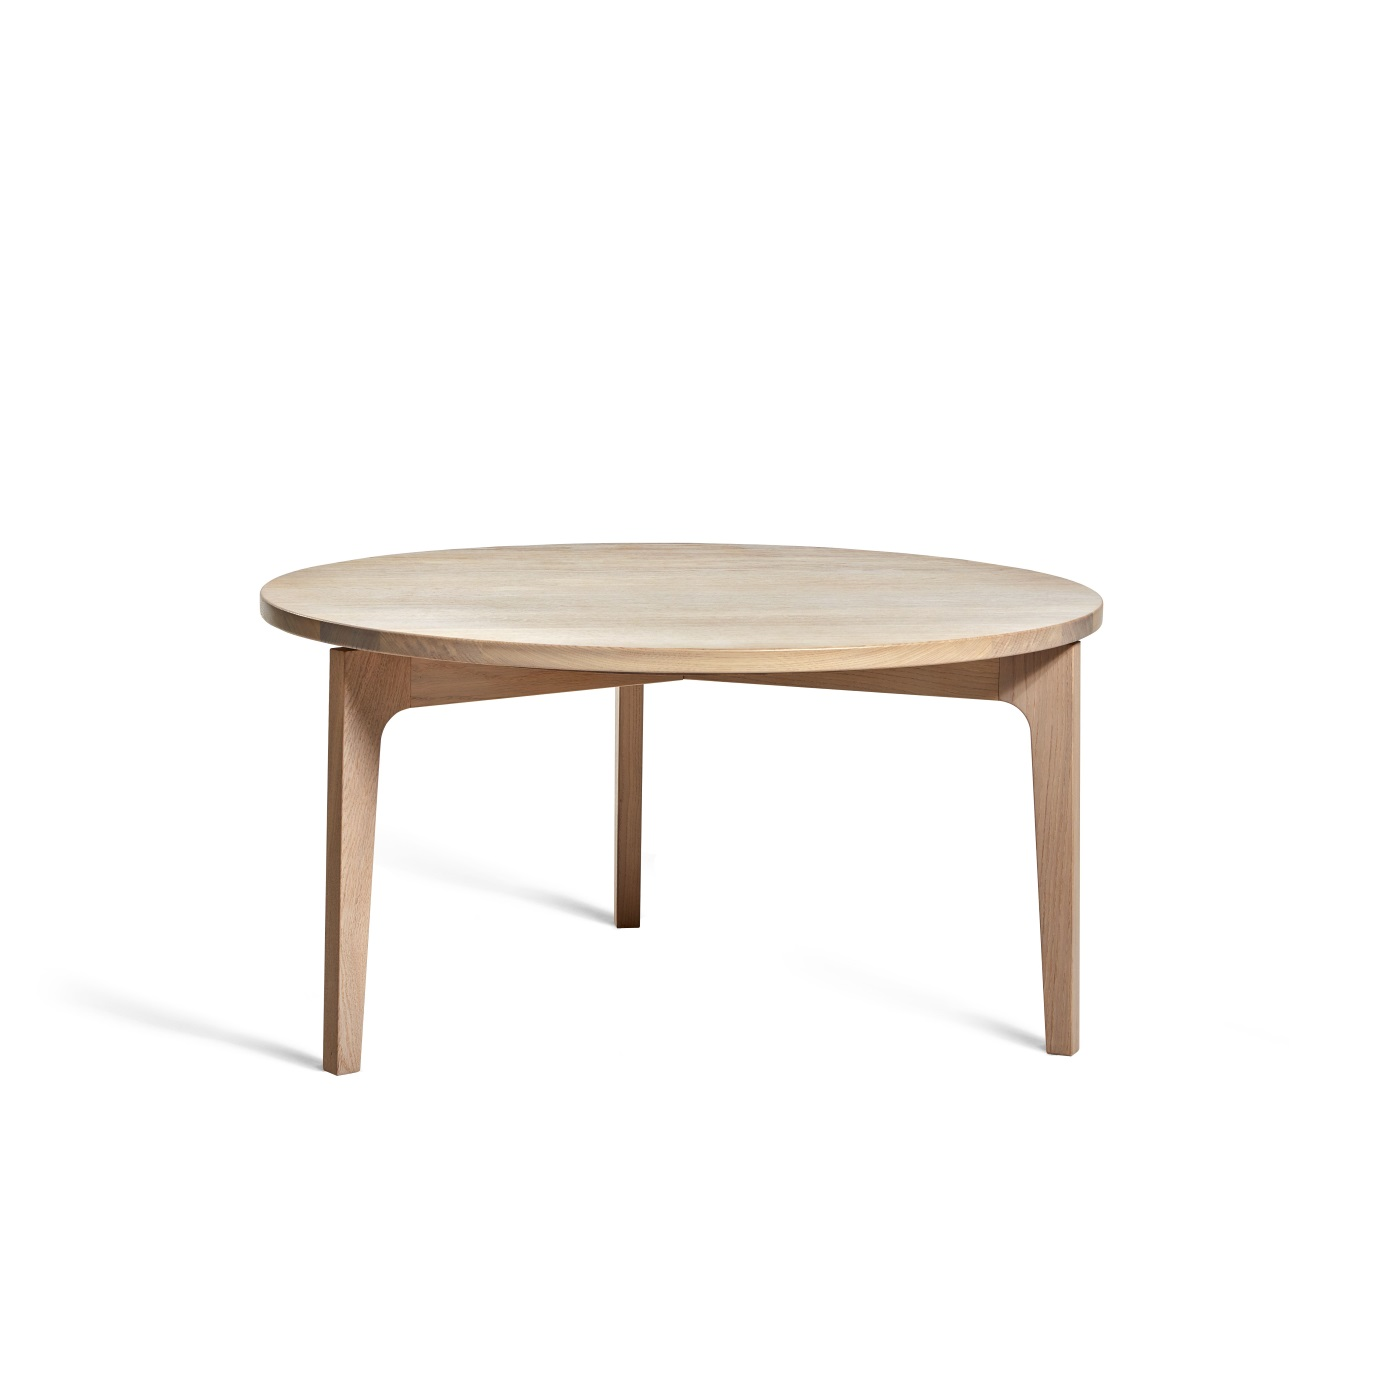 Höllviken soffbord i vitpigmenterad ek Mavis